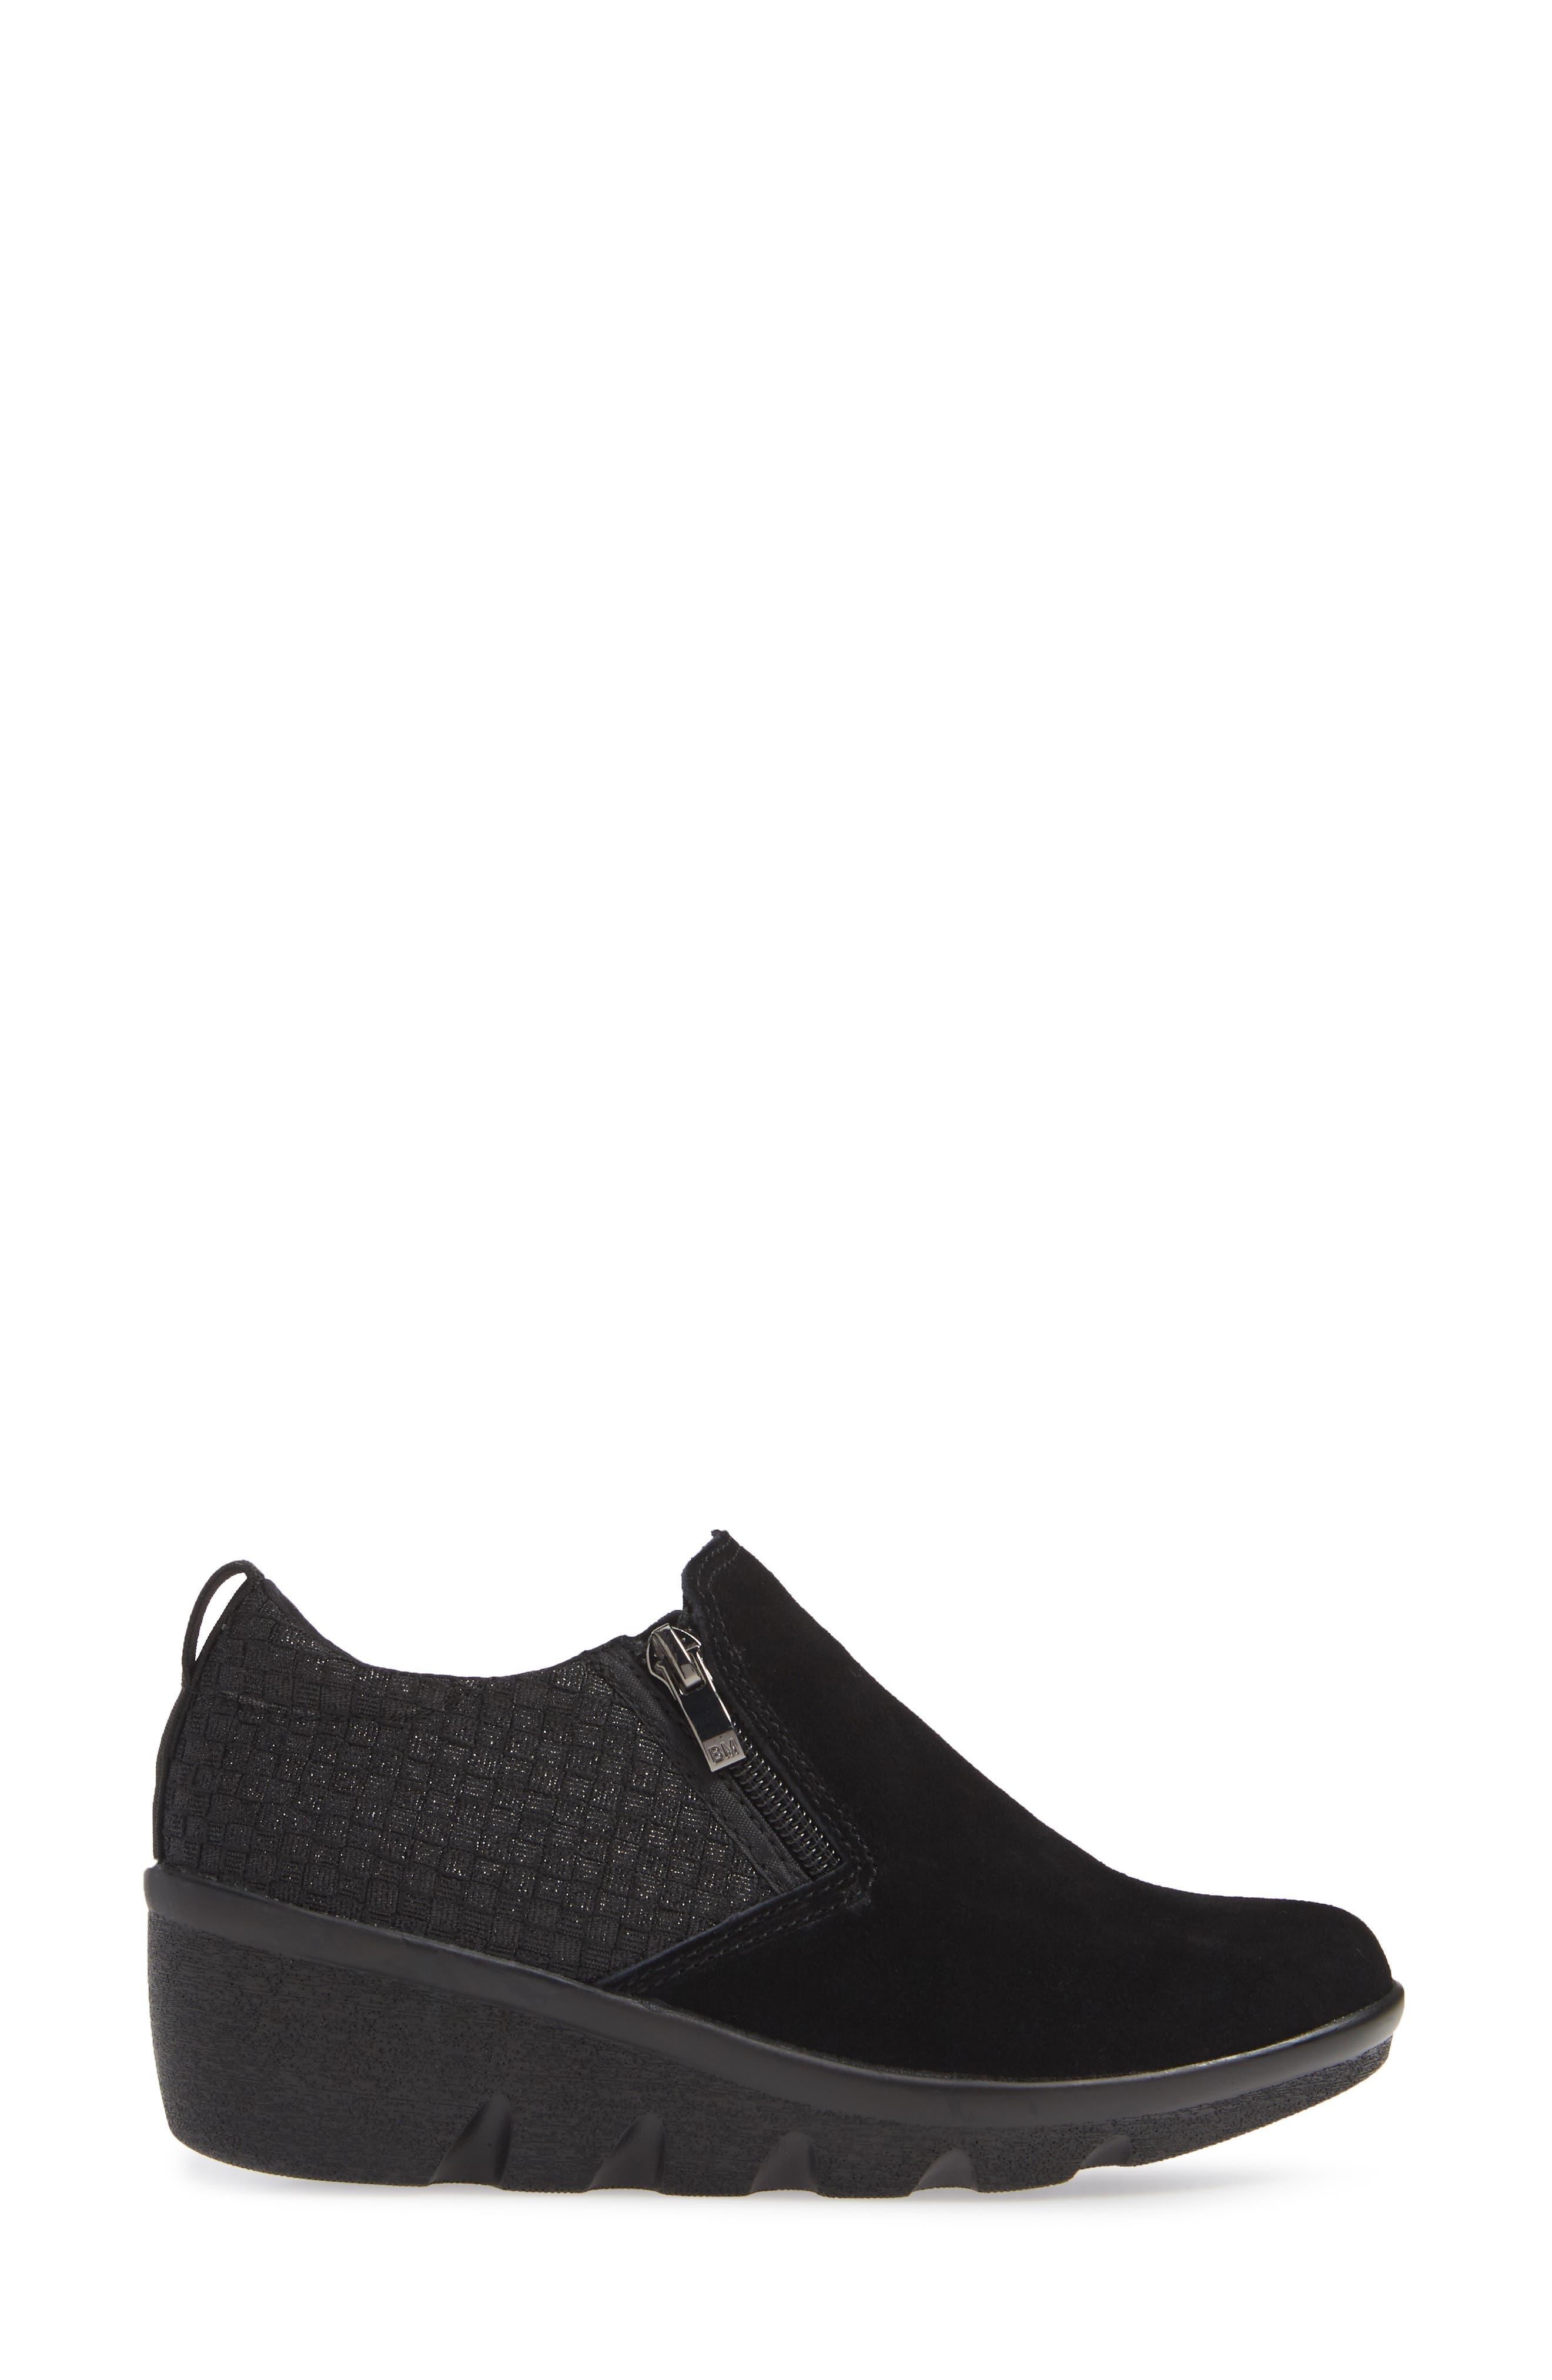 Lihi Ankle Boot,                             Alternate thumbnail 3, color,                             BLACK METALLIC LEATHER